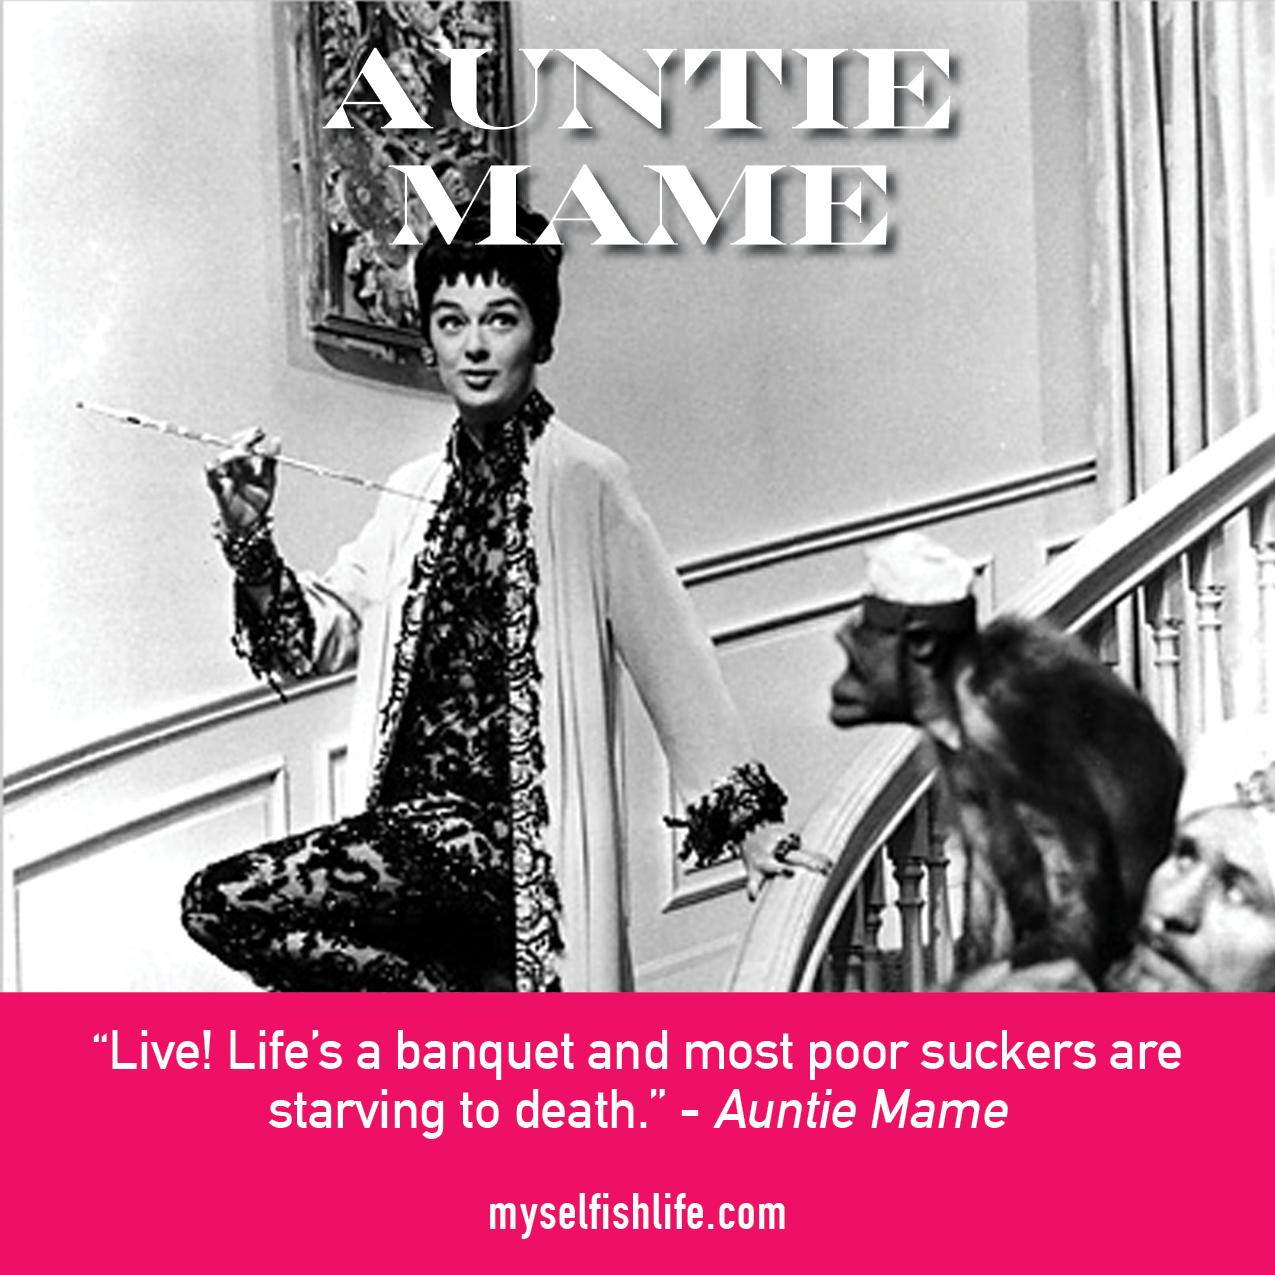 Auntie Mame.jpg